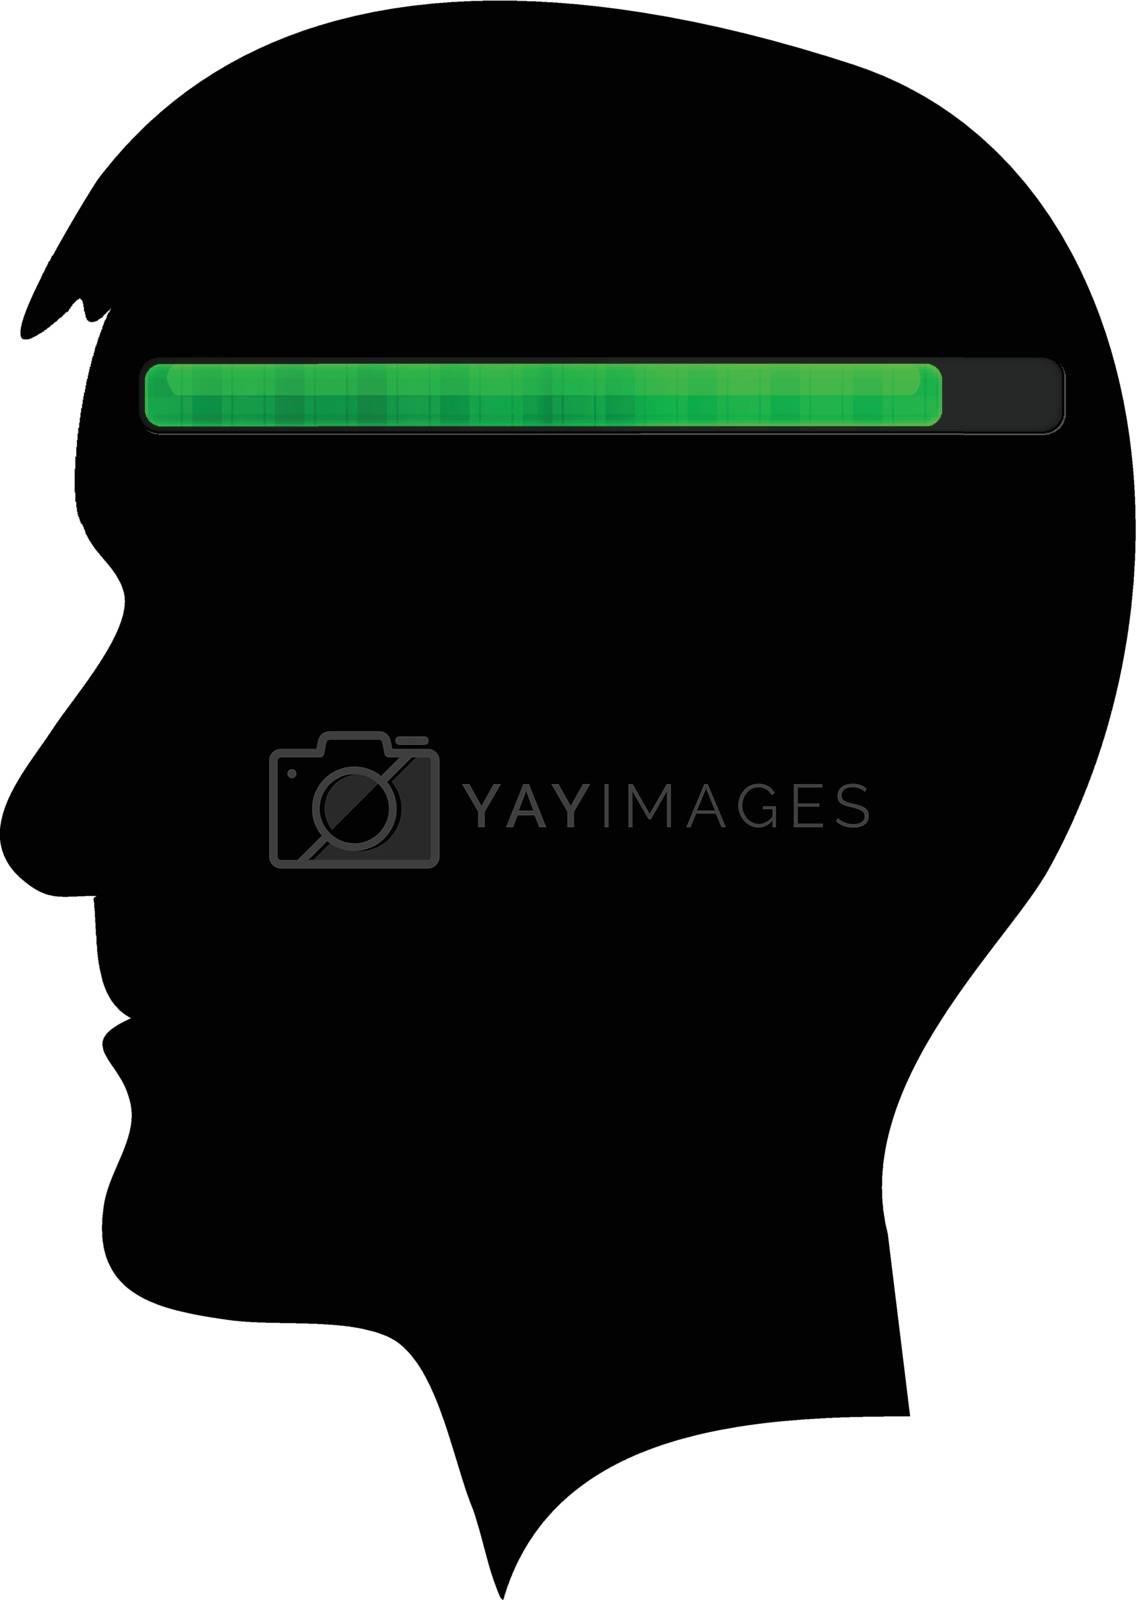 Human head black silhouette with green progress bar